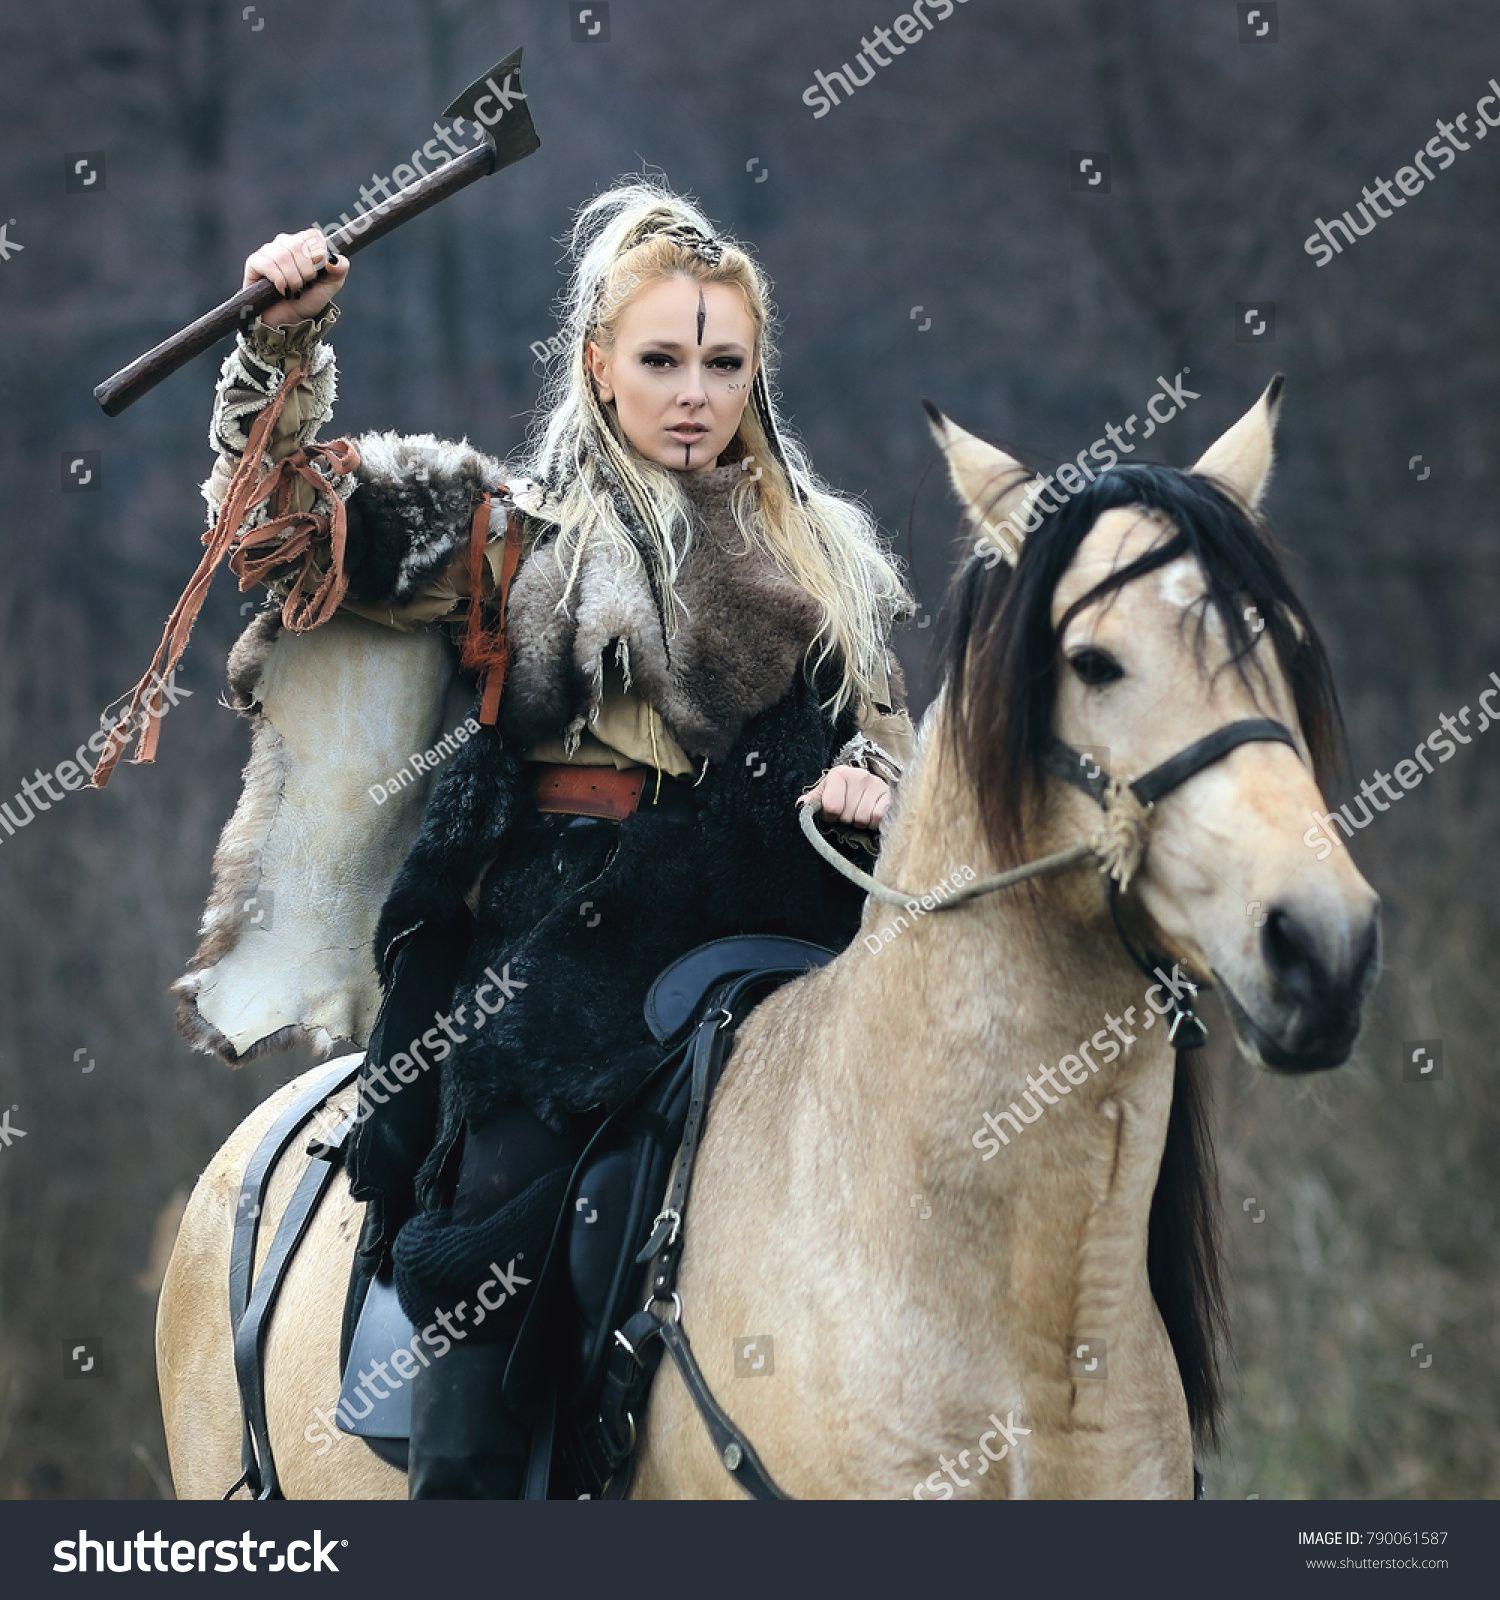 Beautiful Furious Scandinavian Viking Warrior Woman With War Makeup In Traditional Clothes Riding A Horse In Viking Warrior Woman Warrior Woman Viking Warrior